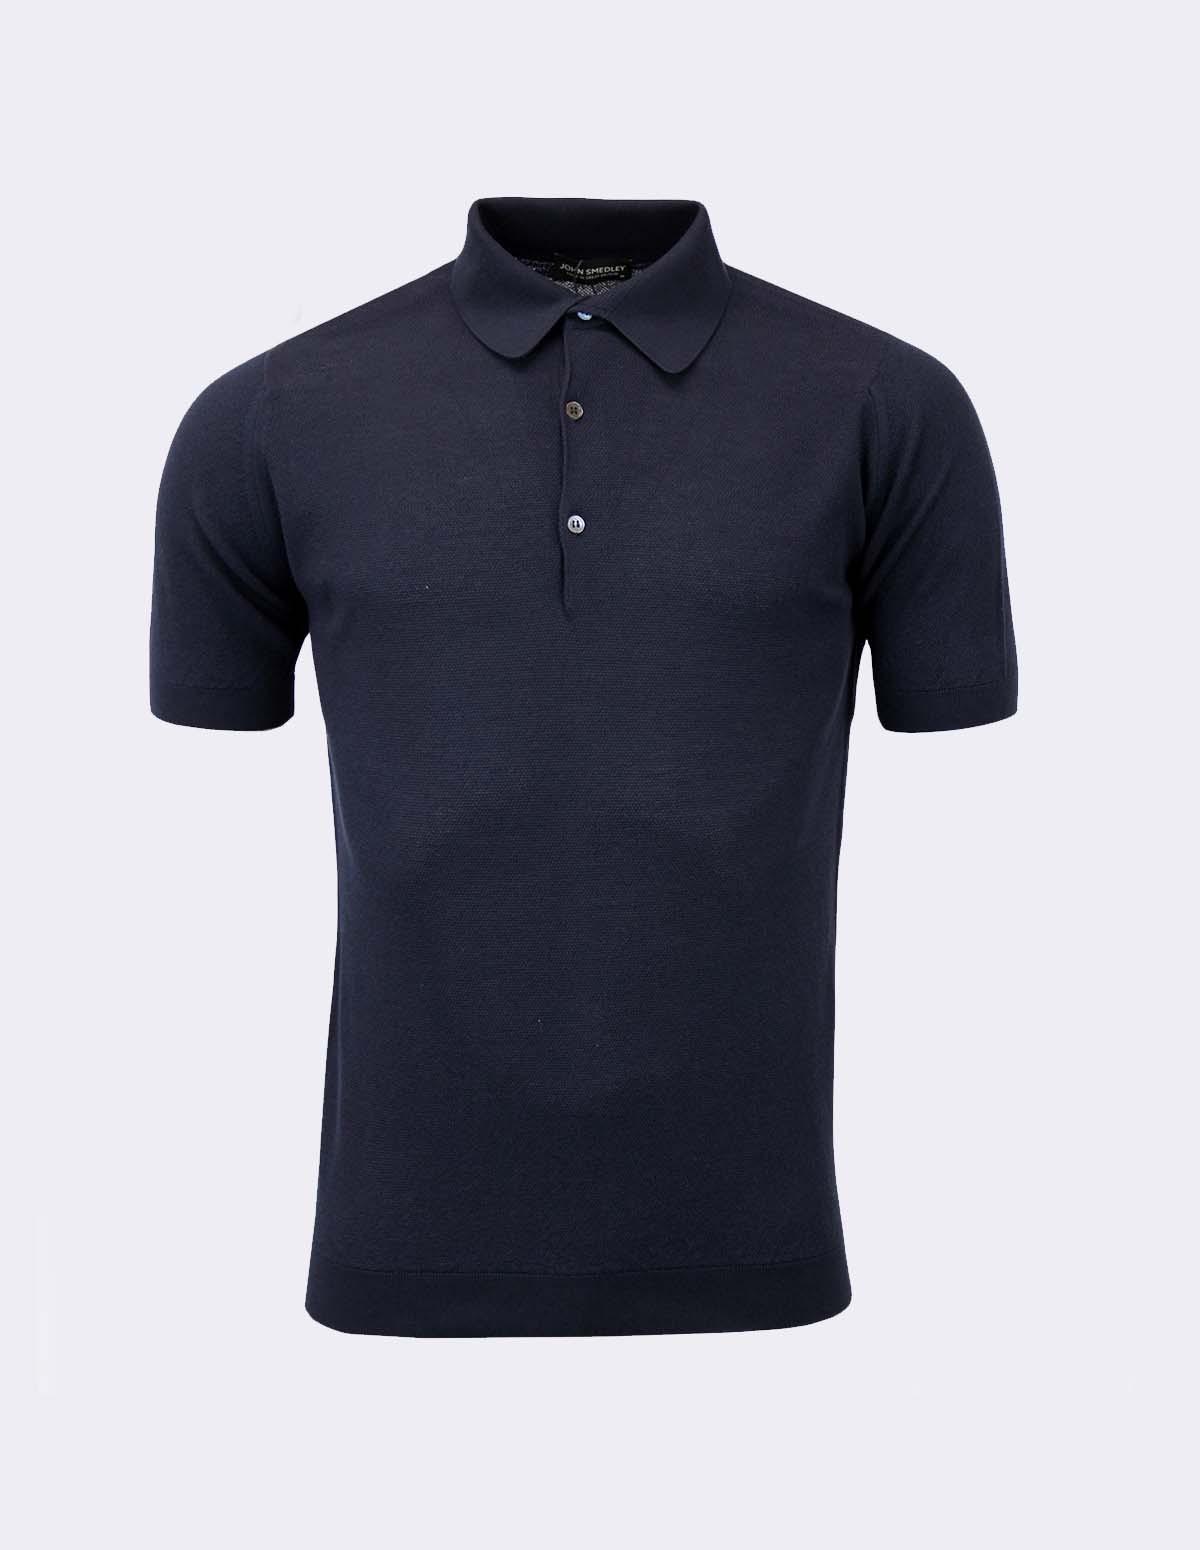 Roth Pique Shirt Ss - NAVY